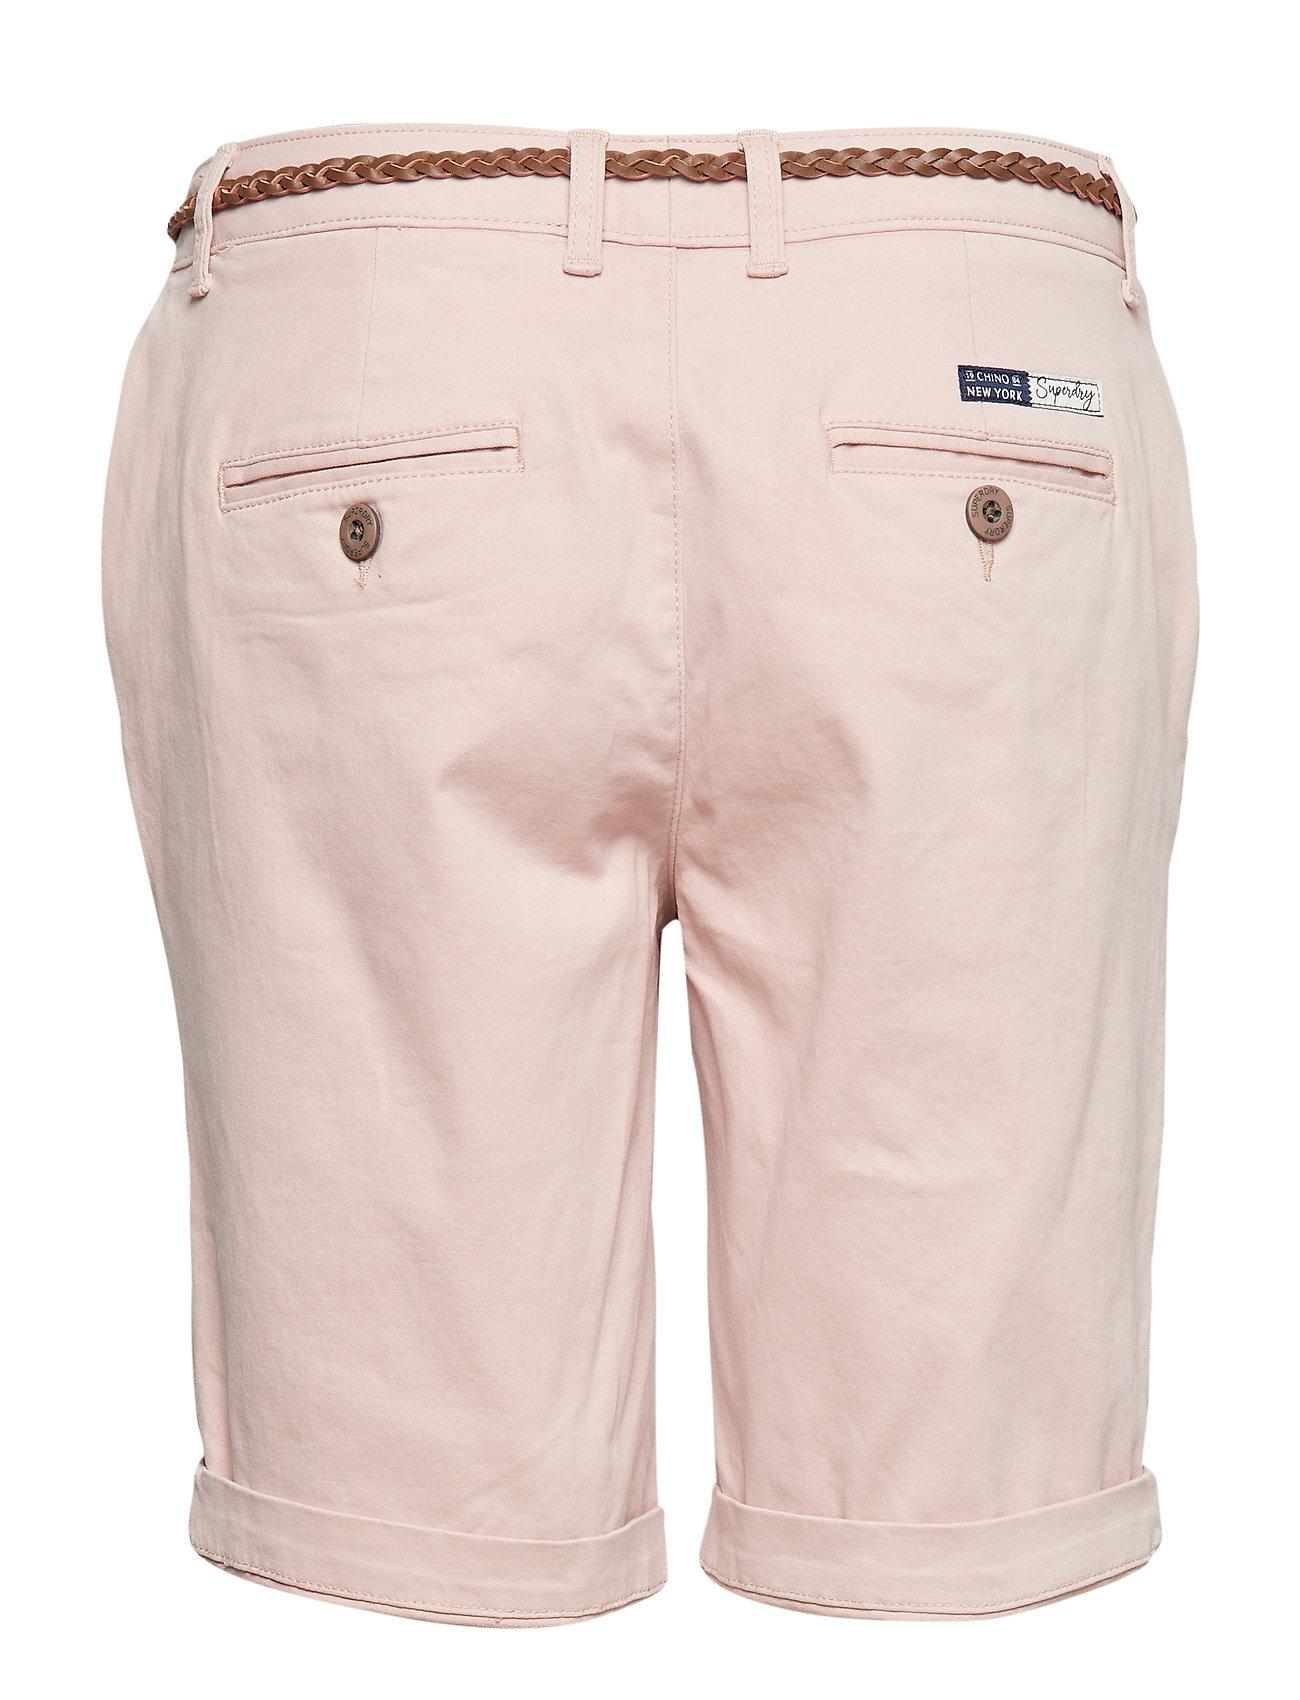 61659c6c Superdry shorts – Chino City Short til dame i OPTIC WHITE - Pashion.dk